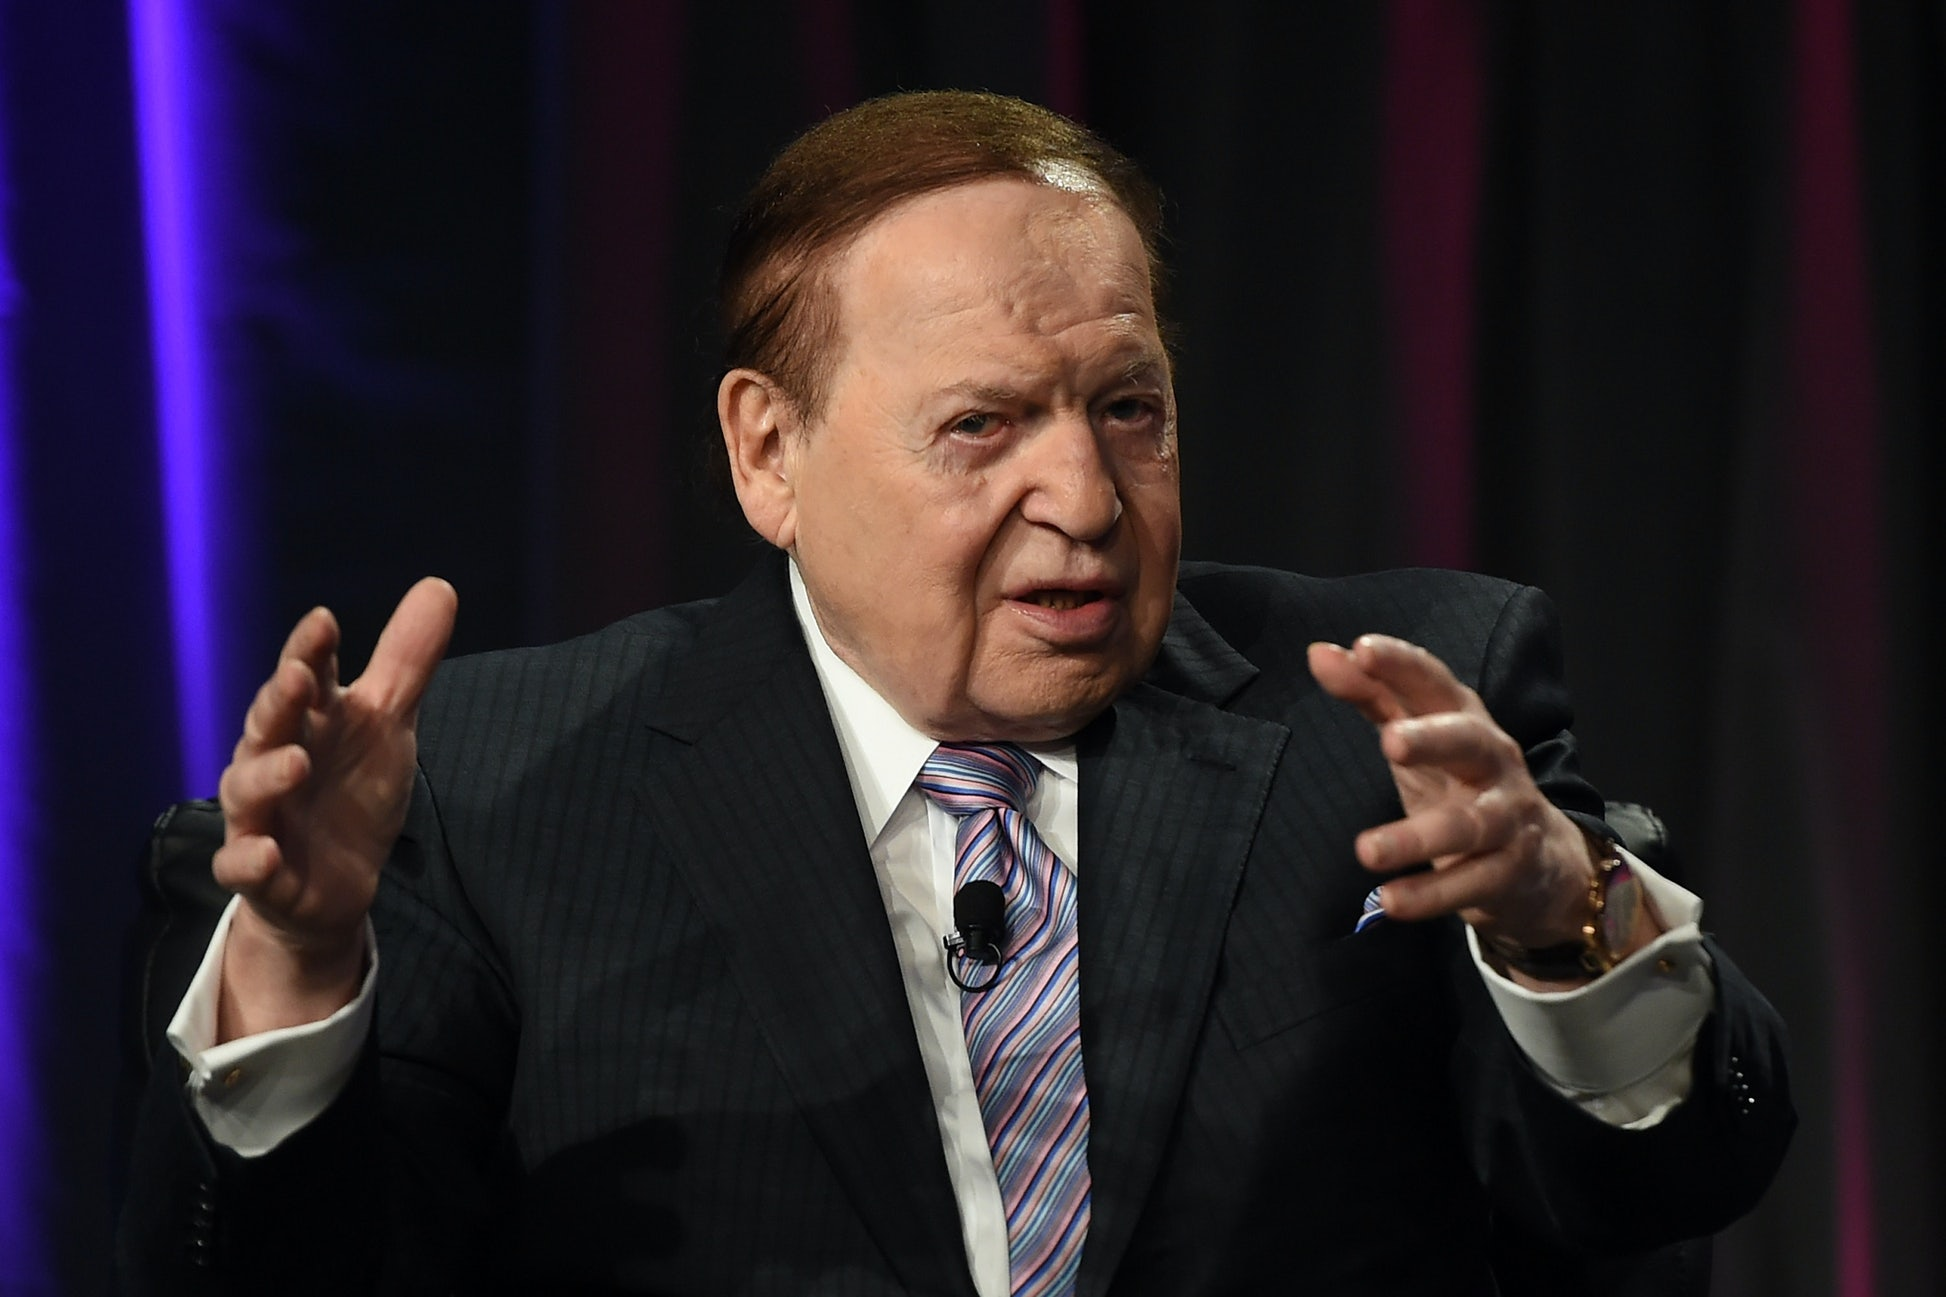 Sheldon Adelson meninggal pada usia 87 tahun